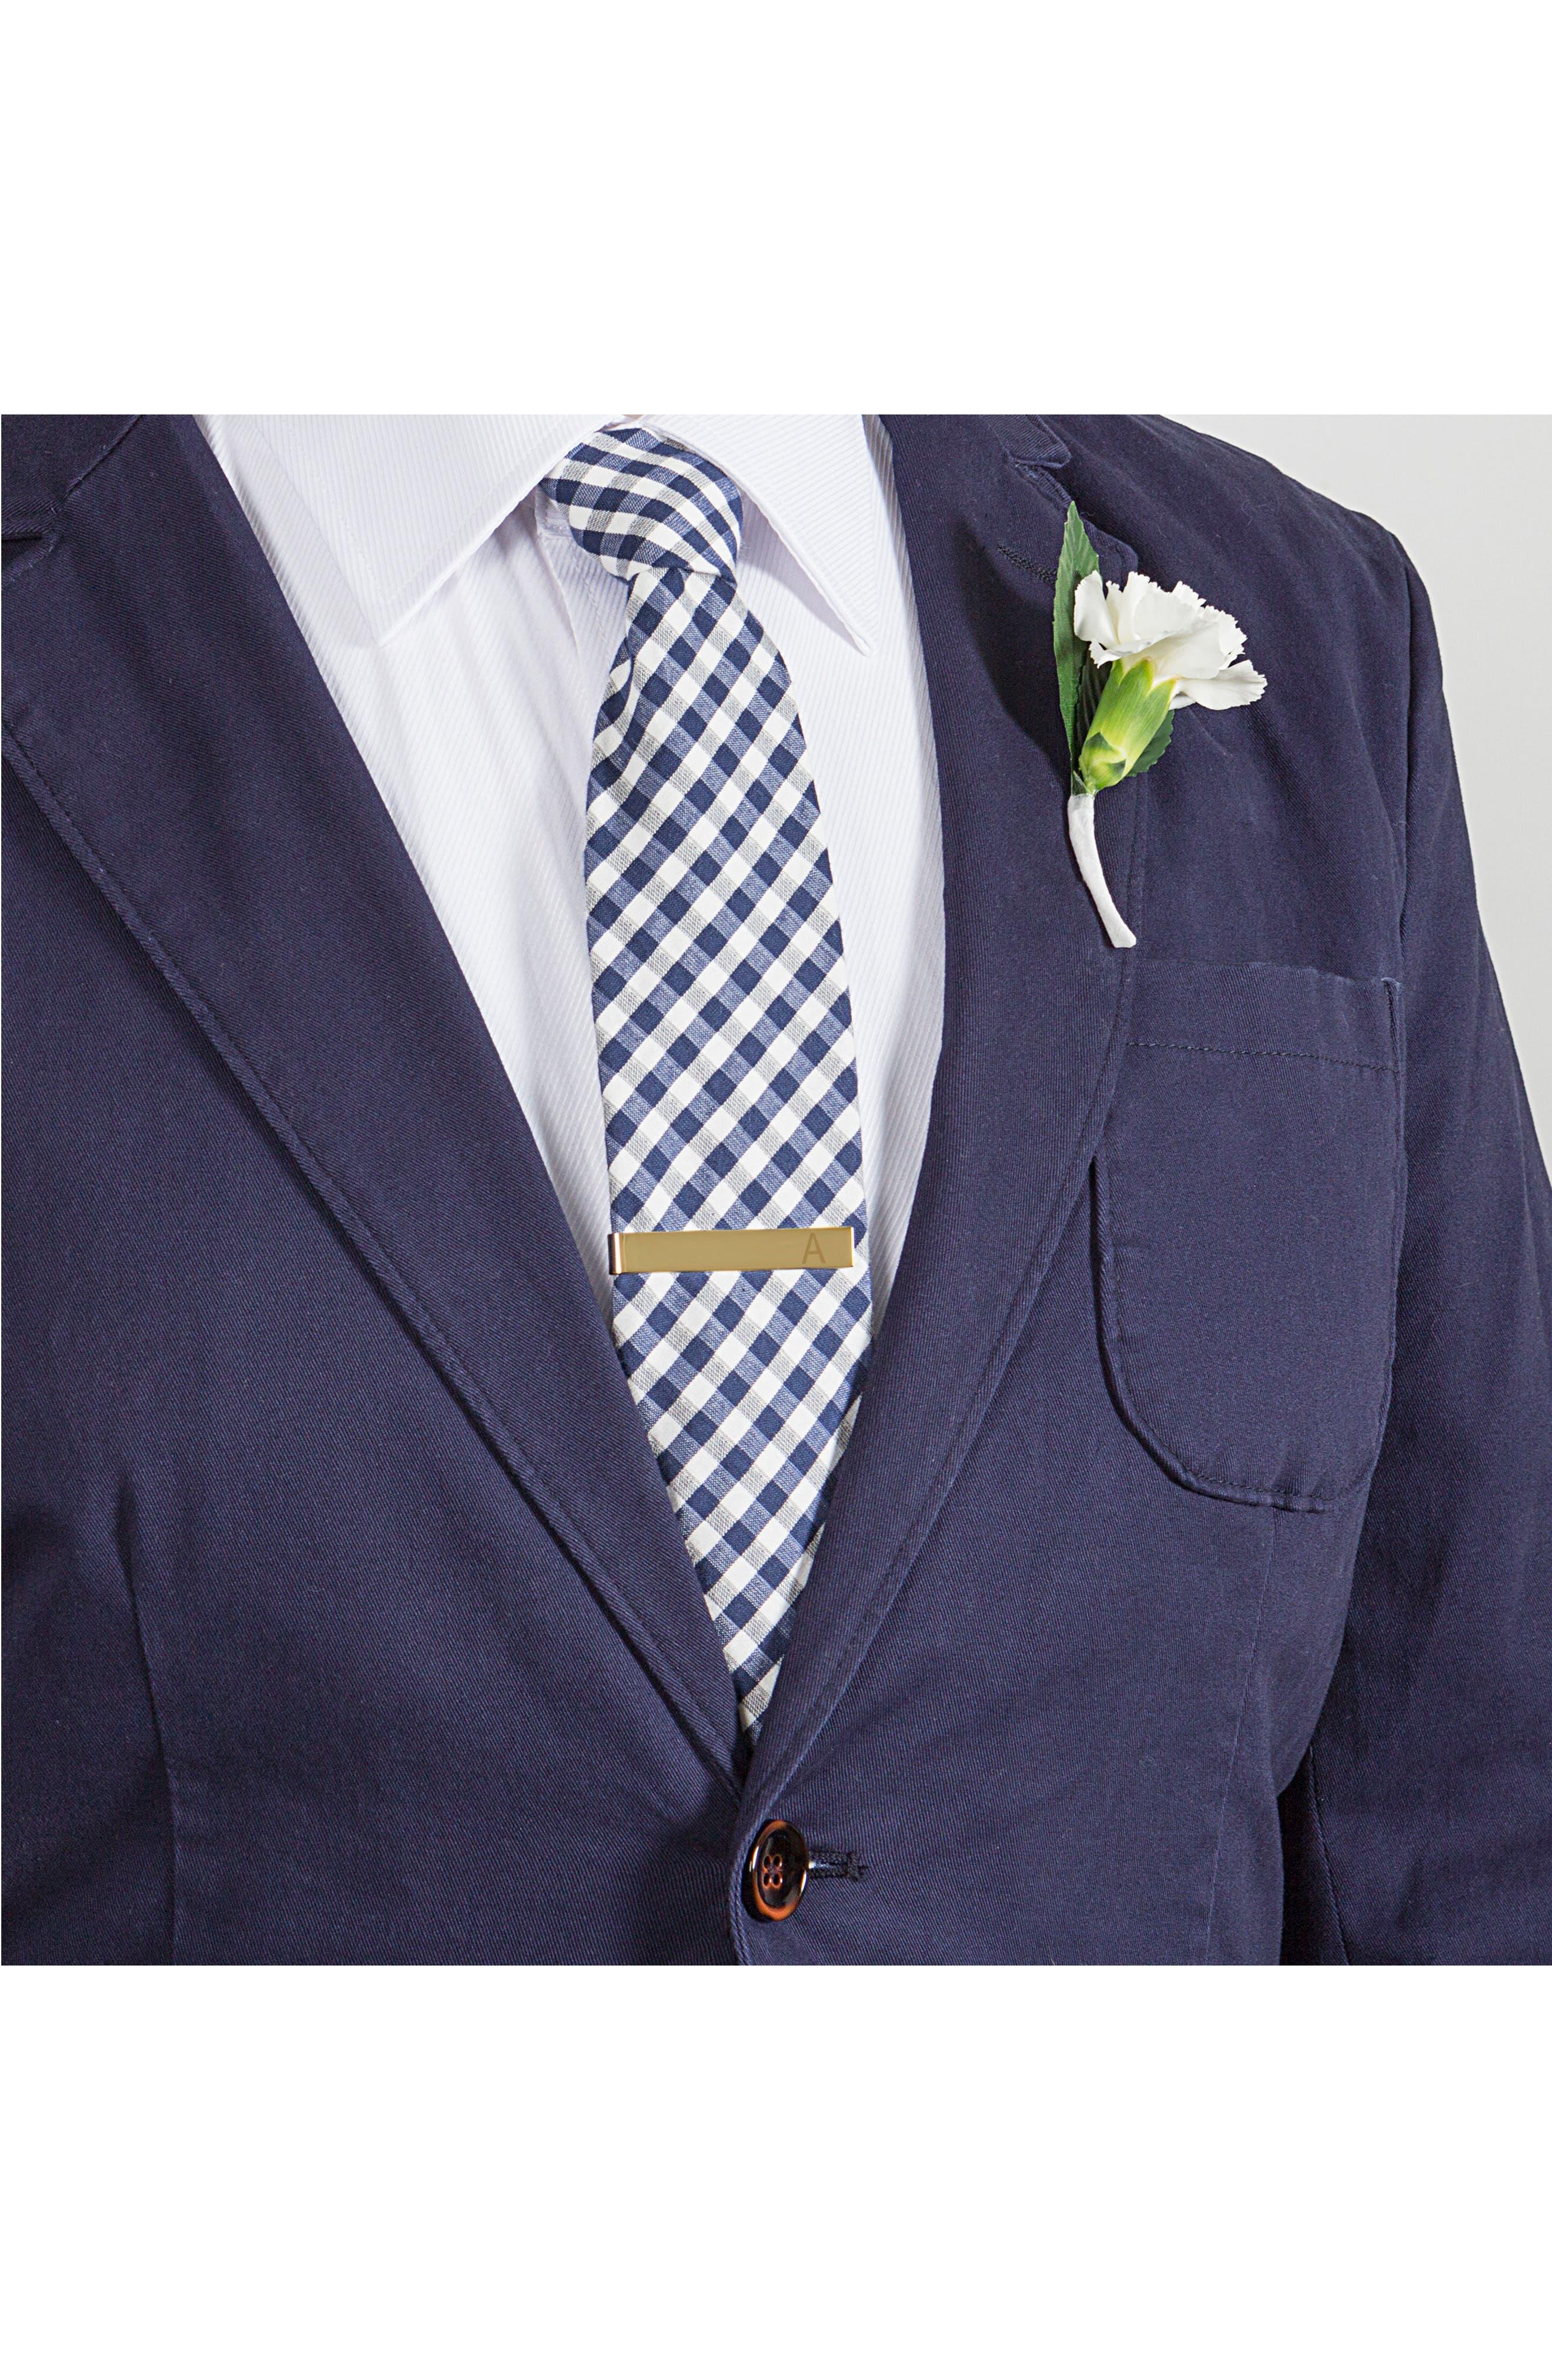 CATHY'S CONCEPTS, Monogram Tie Clip, Alternate thumbnail 2, color, GOLD